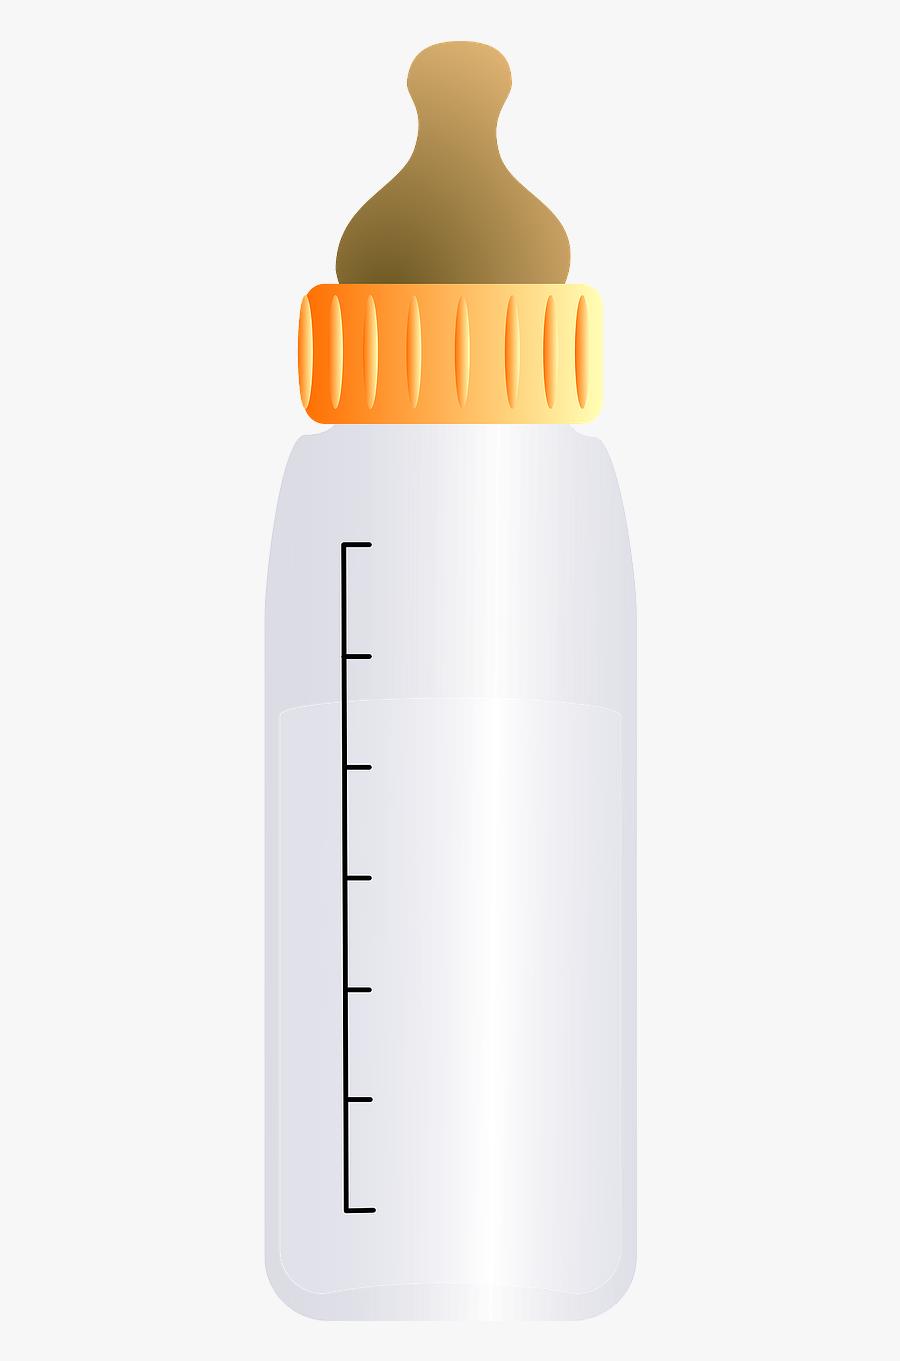 Free To Use & Public Domain Baby Bottle Clip Art - Baby Bottle, Transparent Clipart